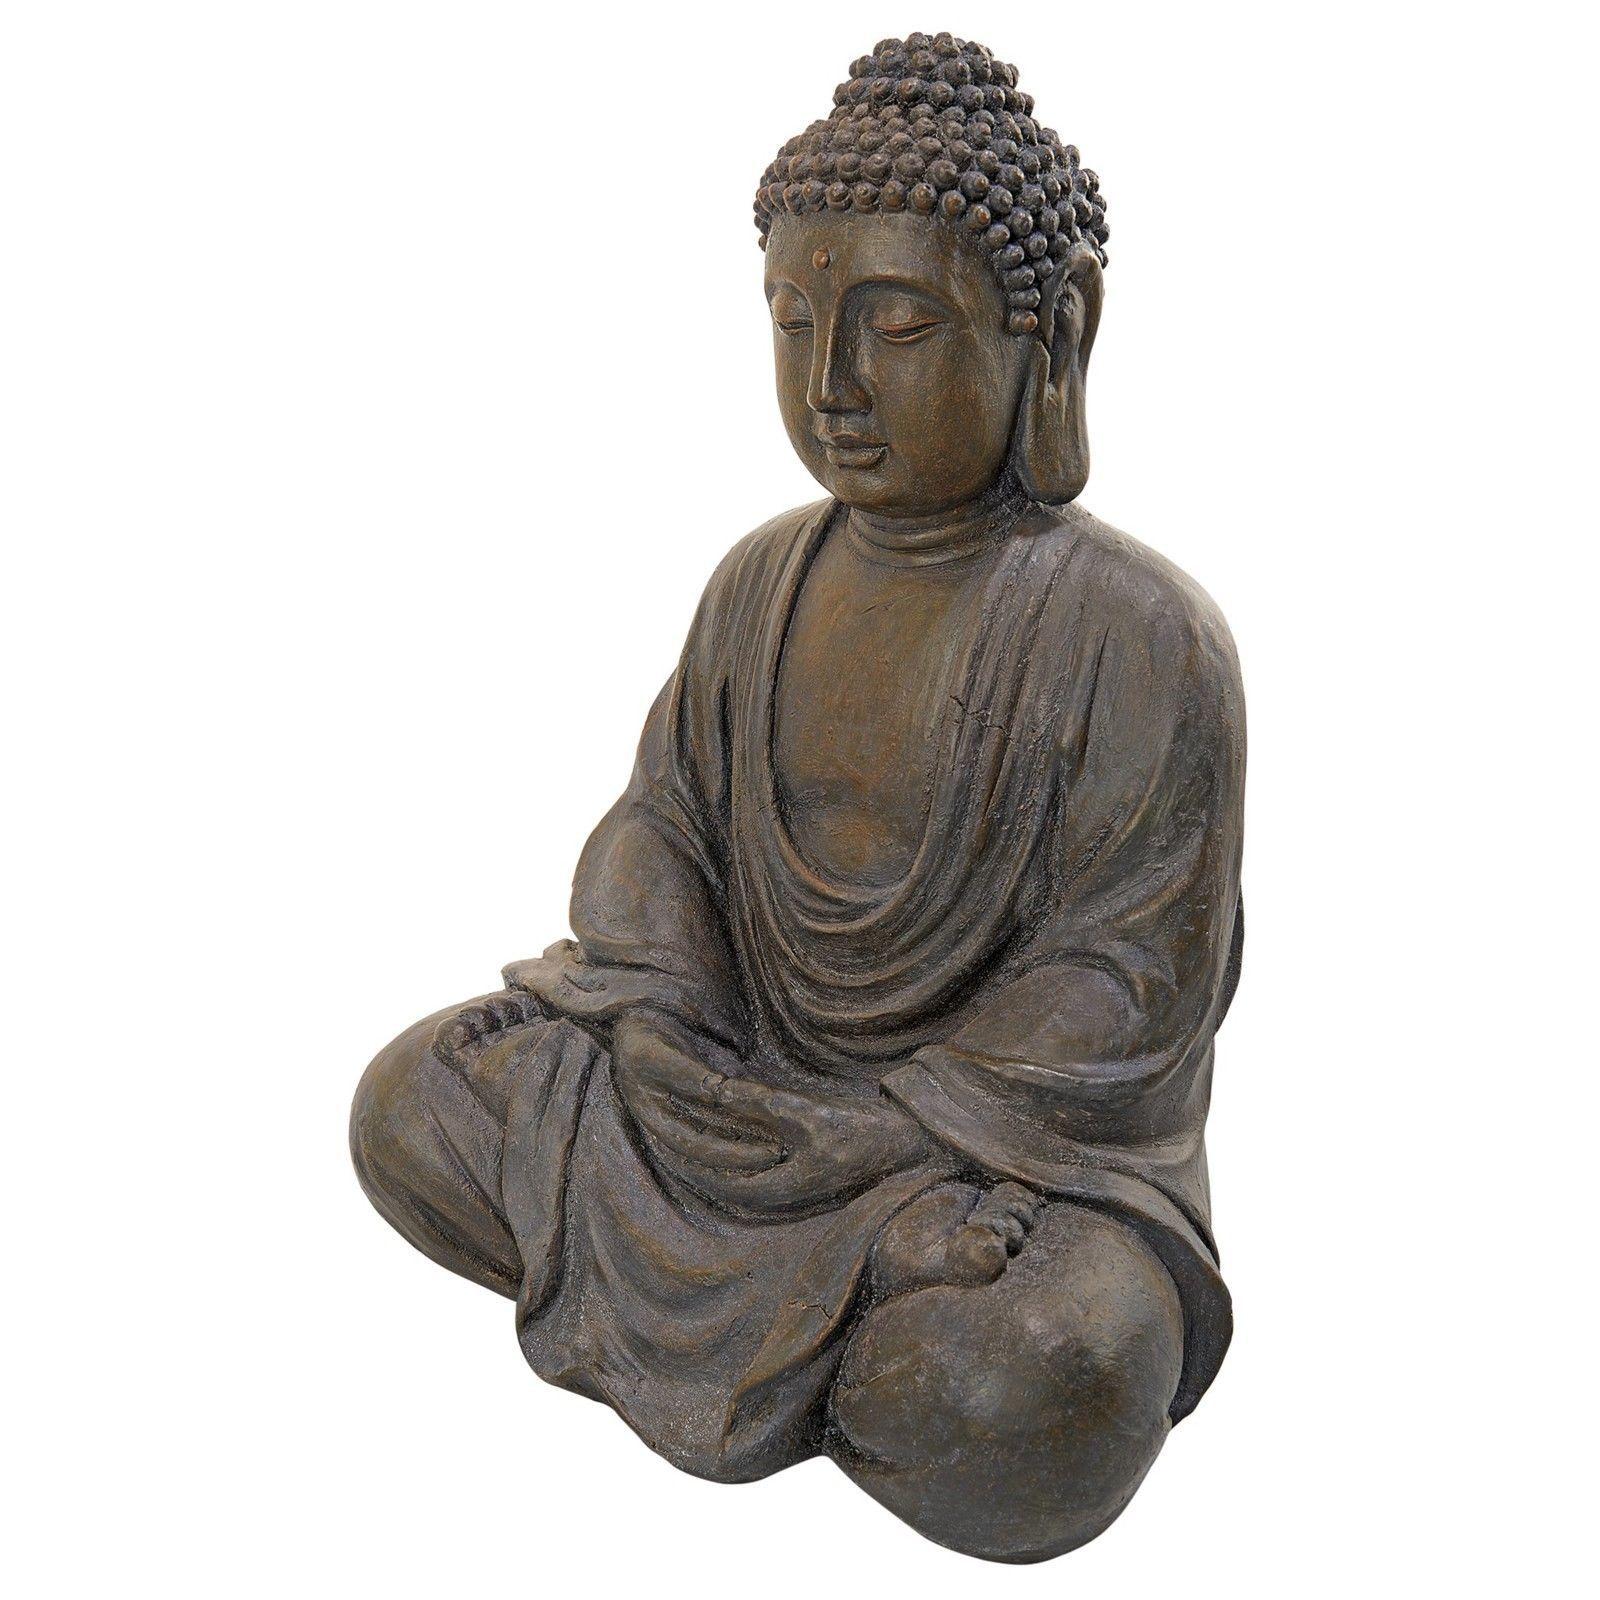 Garden decor statues  Large Buddha Statue Zen Garden Decor Outdoor Spiritual Sitting